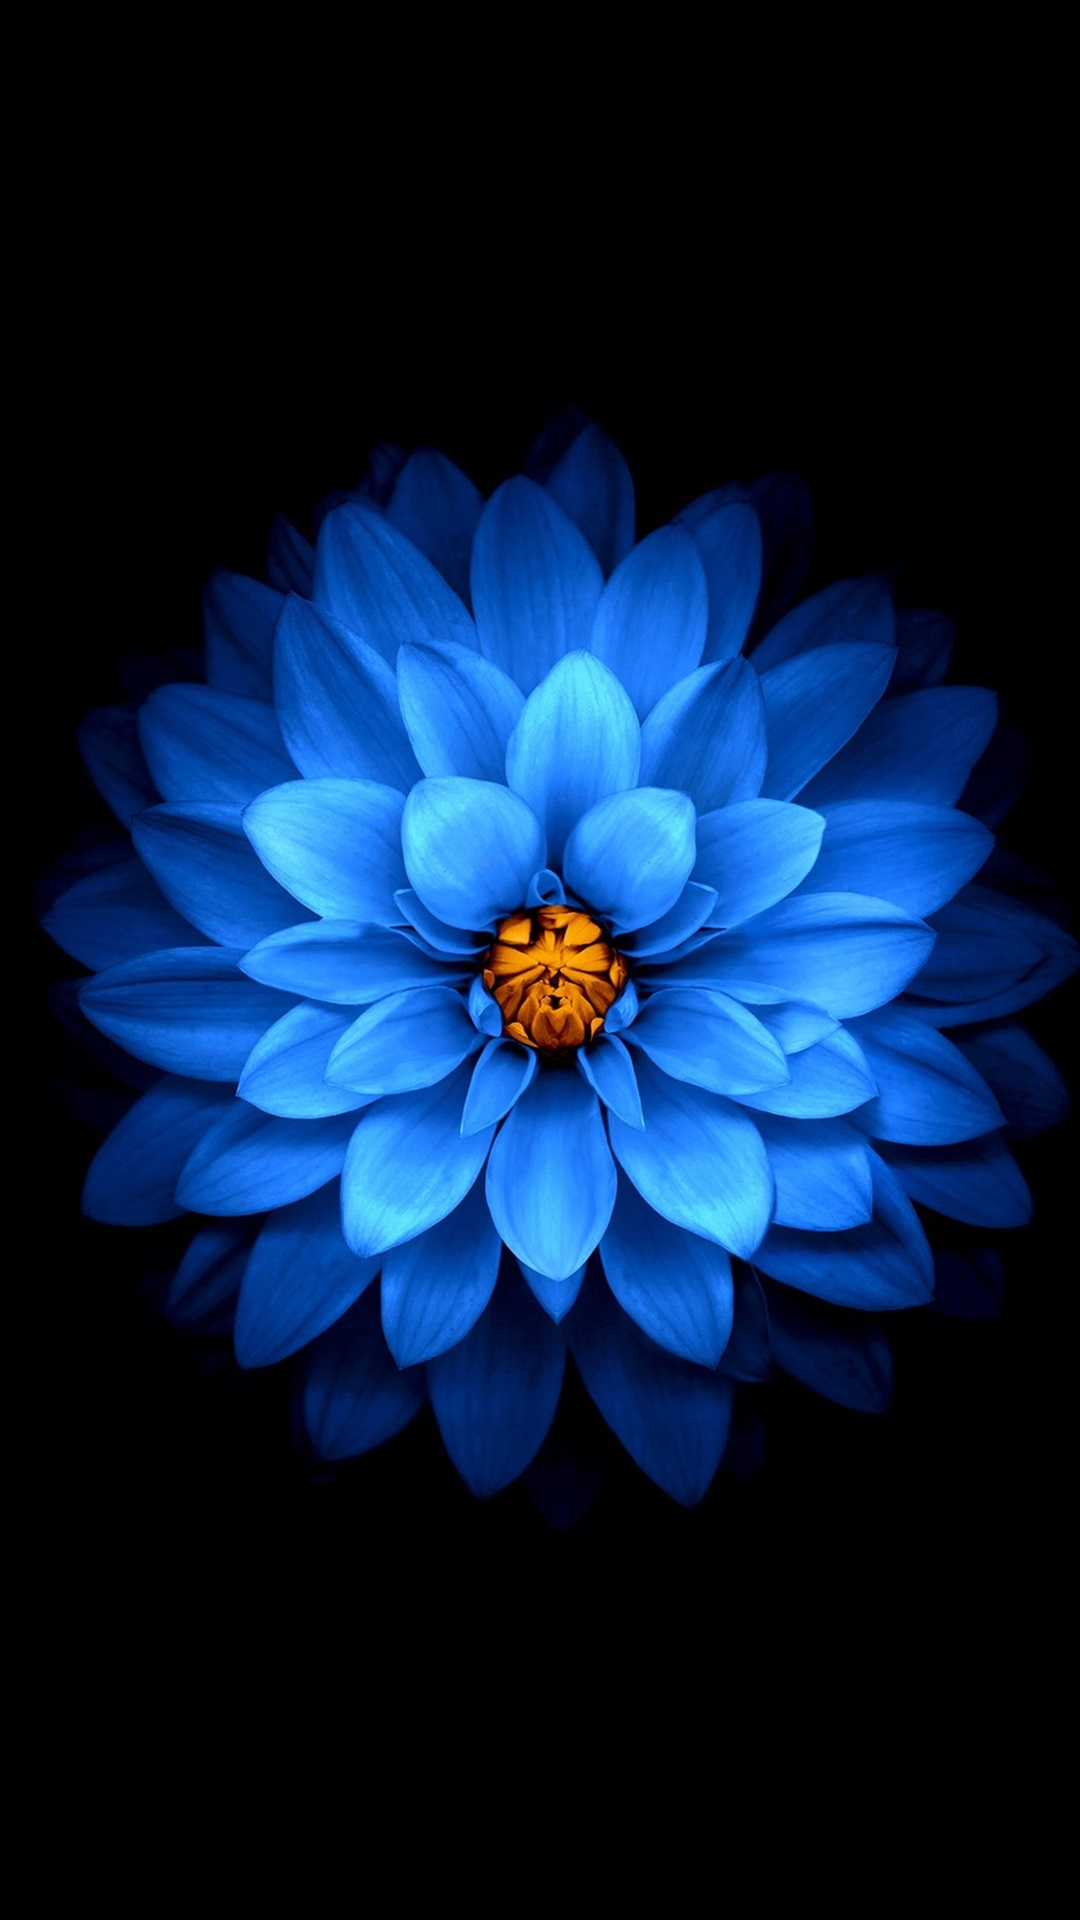 Wallpaper Blue Flower Close Up Black Background 3840x2160